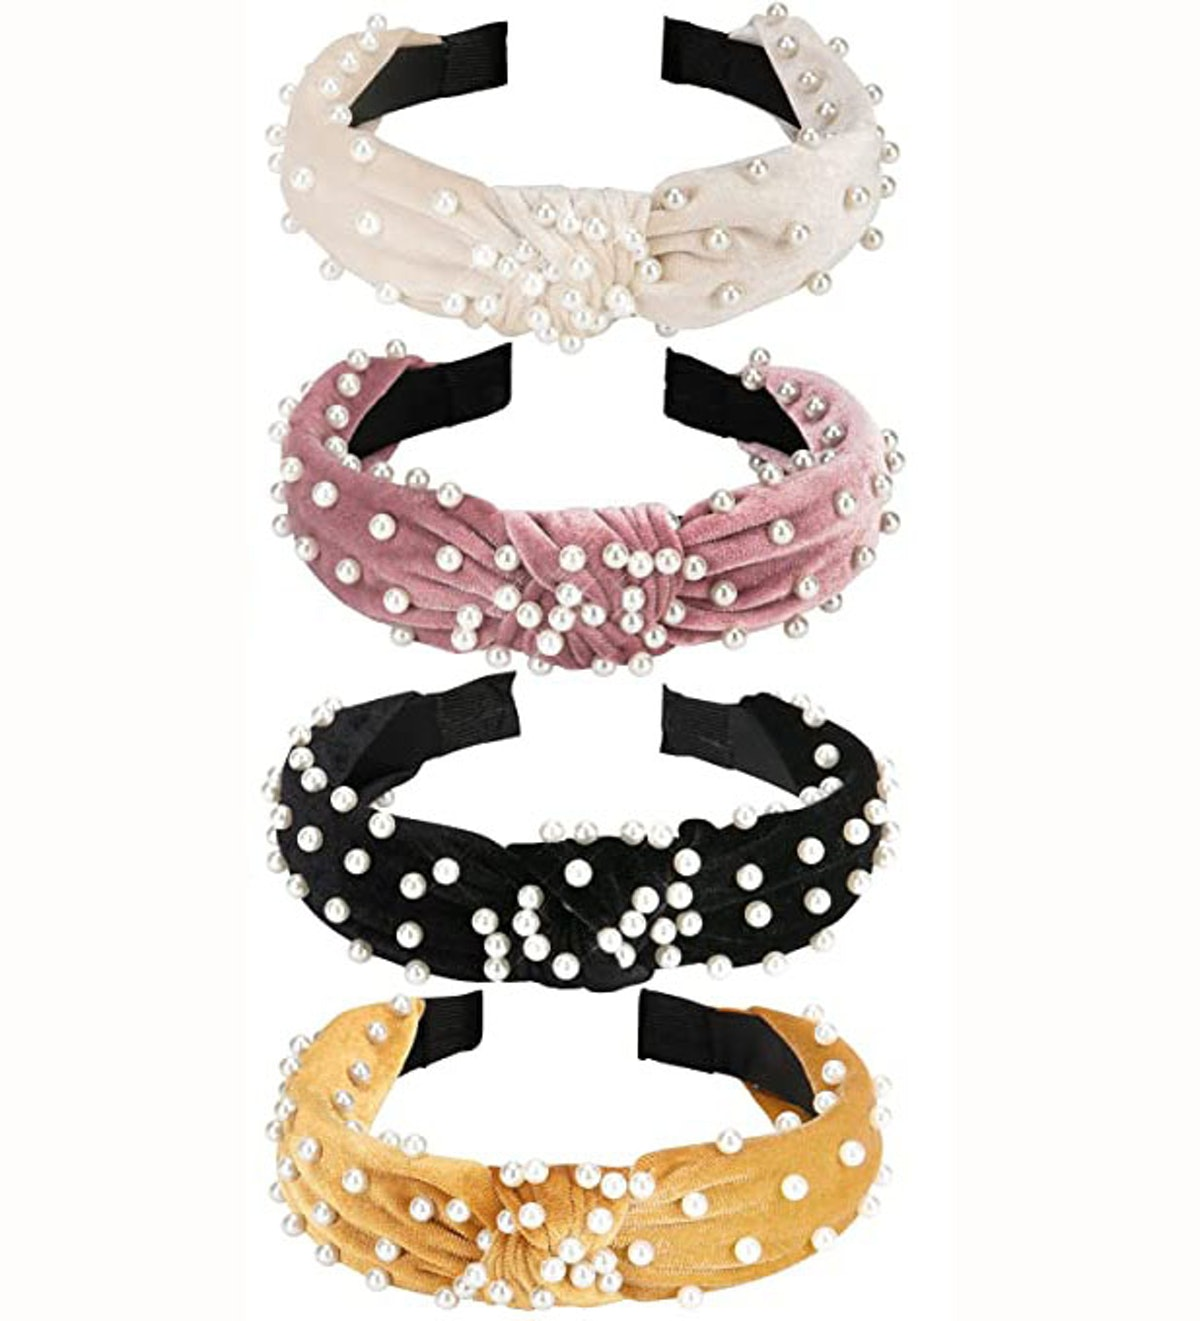 Allucho Velvet Headbands (4-Pack)